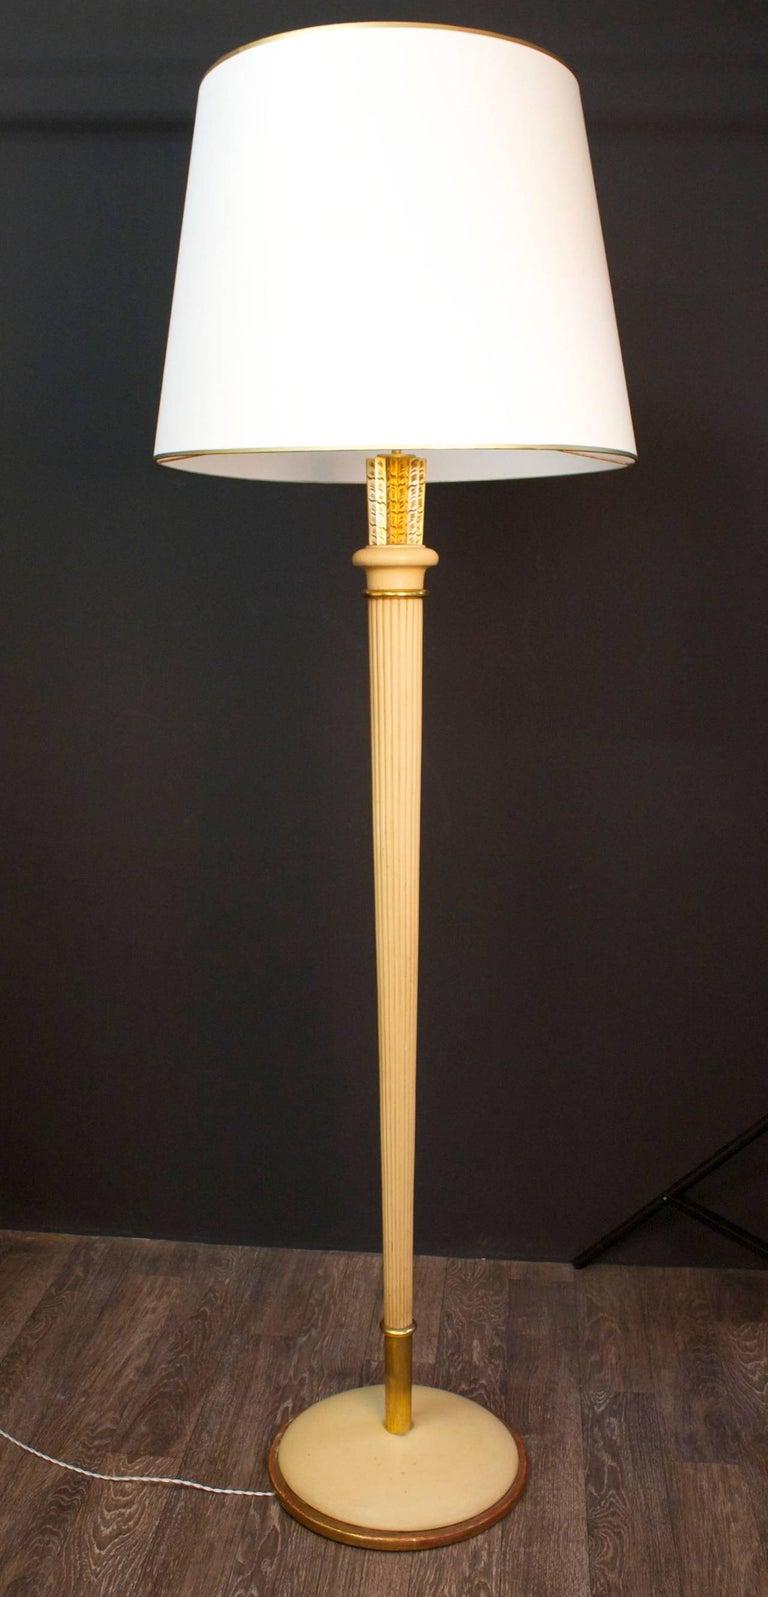 Mid-20th Century Art Deco Floor Lamp For Sale